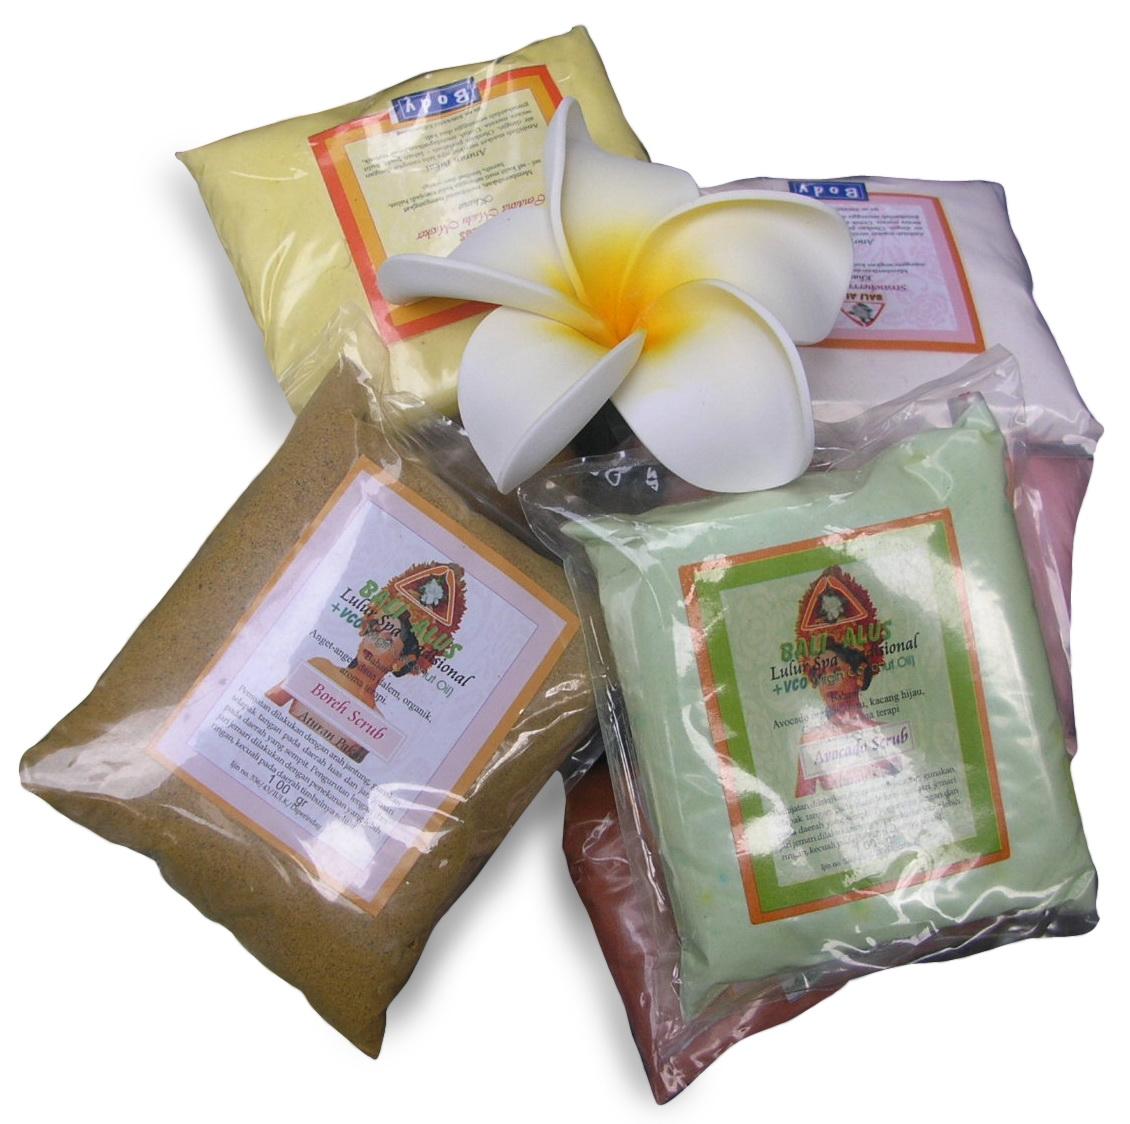 Bali Alus Beli Lulur Disini Aja Spa Cream 100gr Green Tea Bubuk Lbba Varian Avocado Bengkuang Boreh Cendana Madu Chocolate Coffee Jasmine Aloevera Milk Seaweed Strawberry